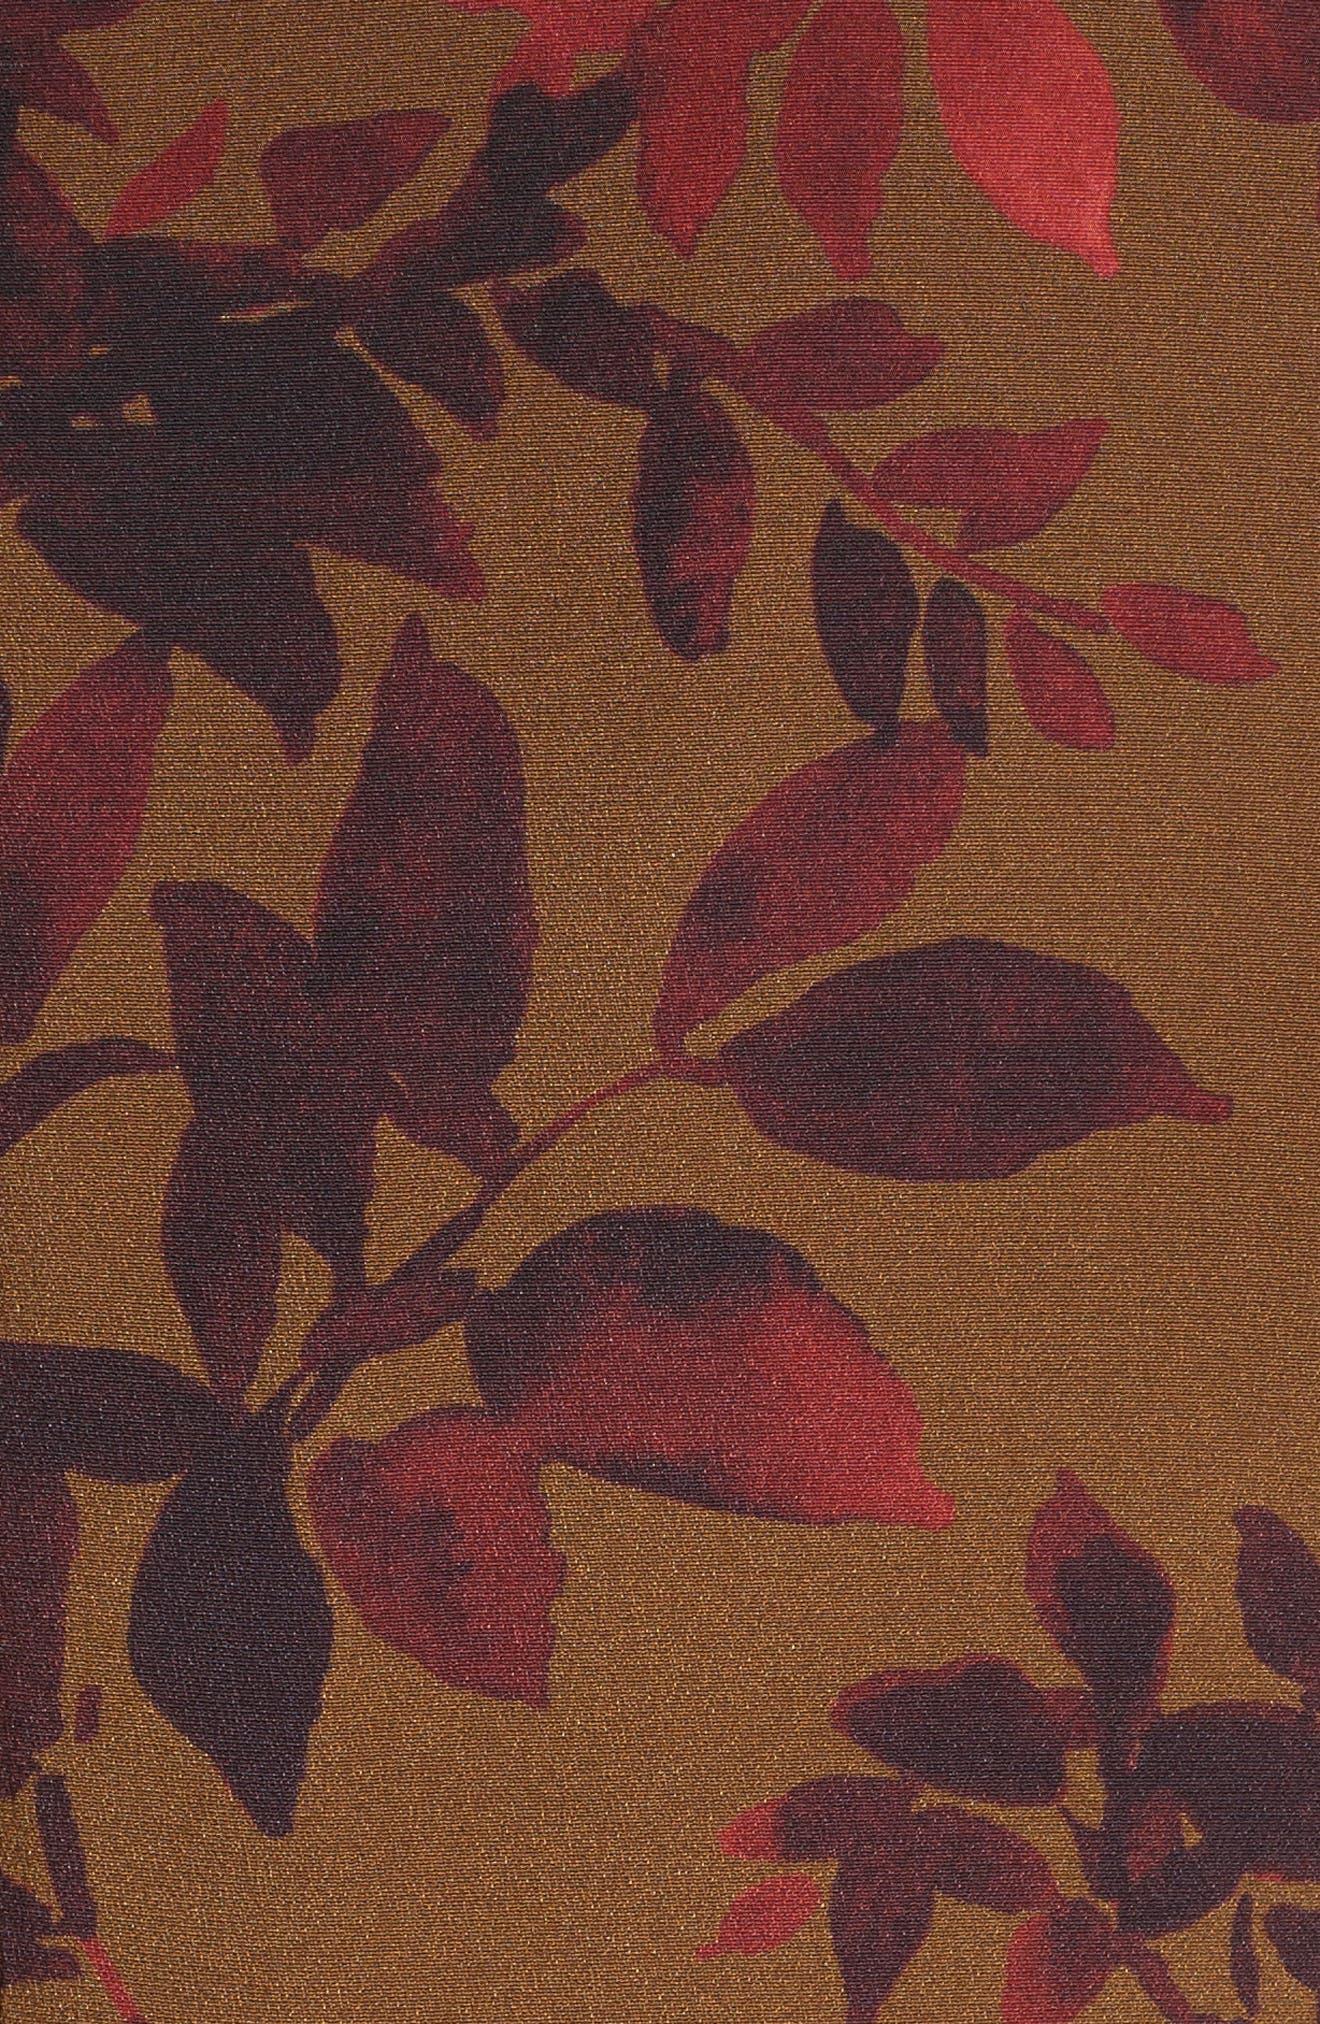 Sidra Floral Print Silk Dress,                             Alternate thumbnail 5, color,                             242